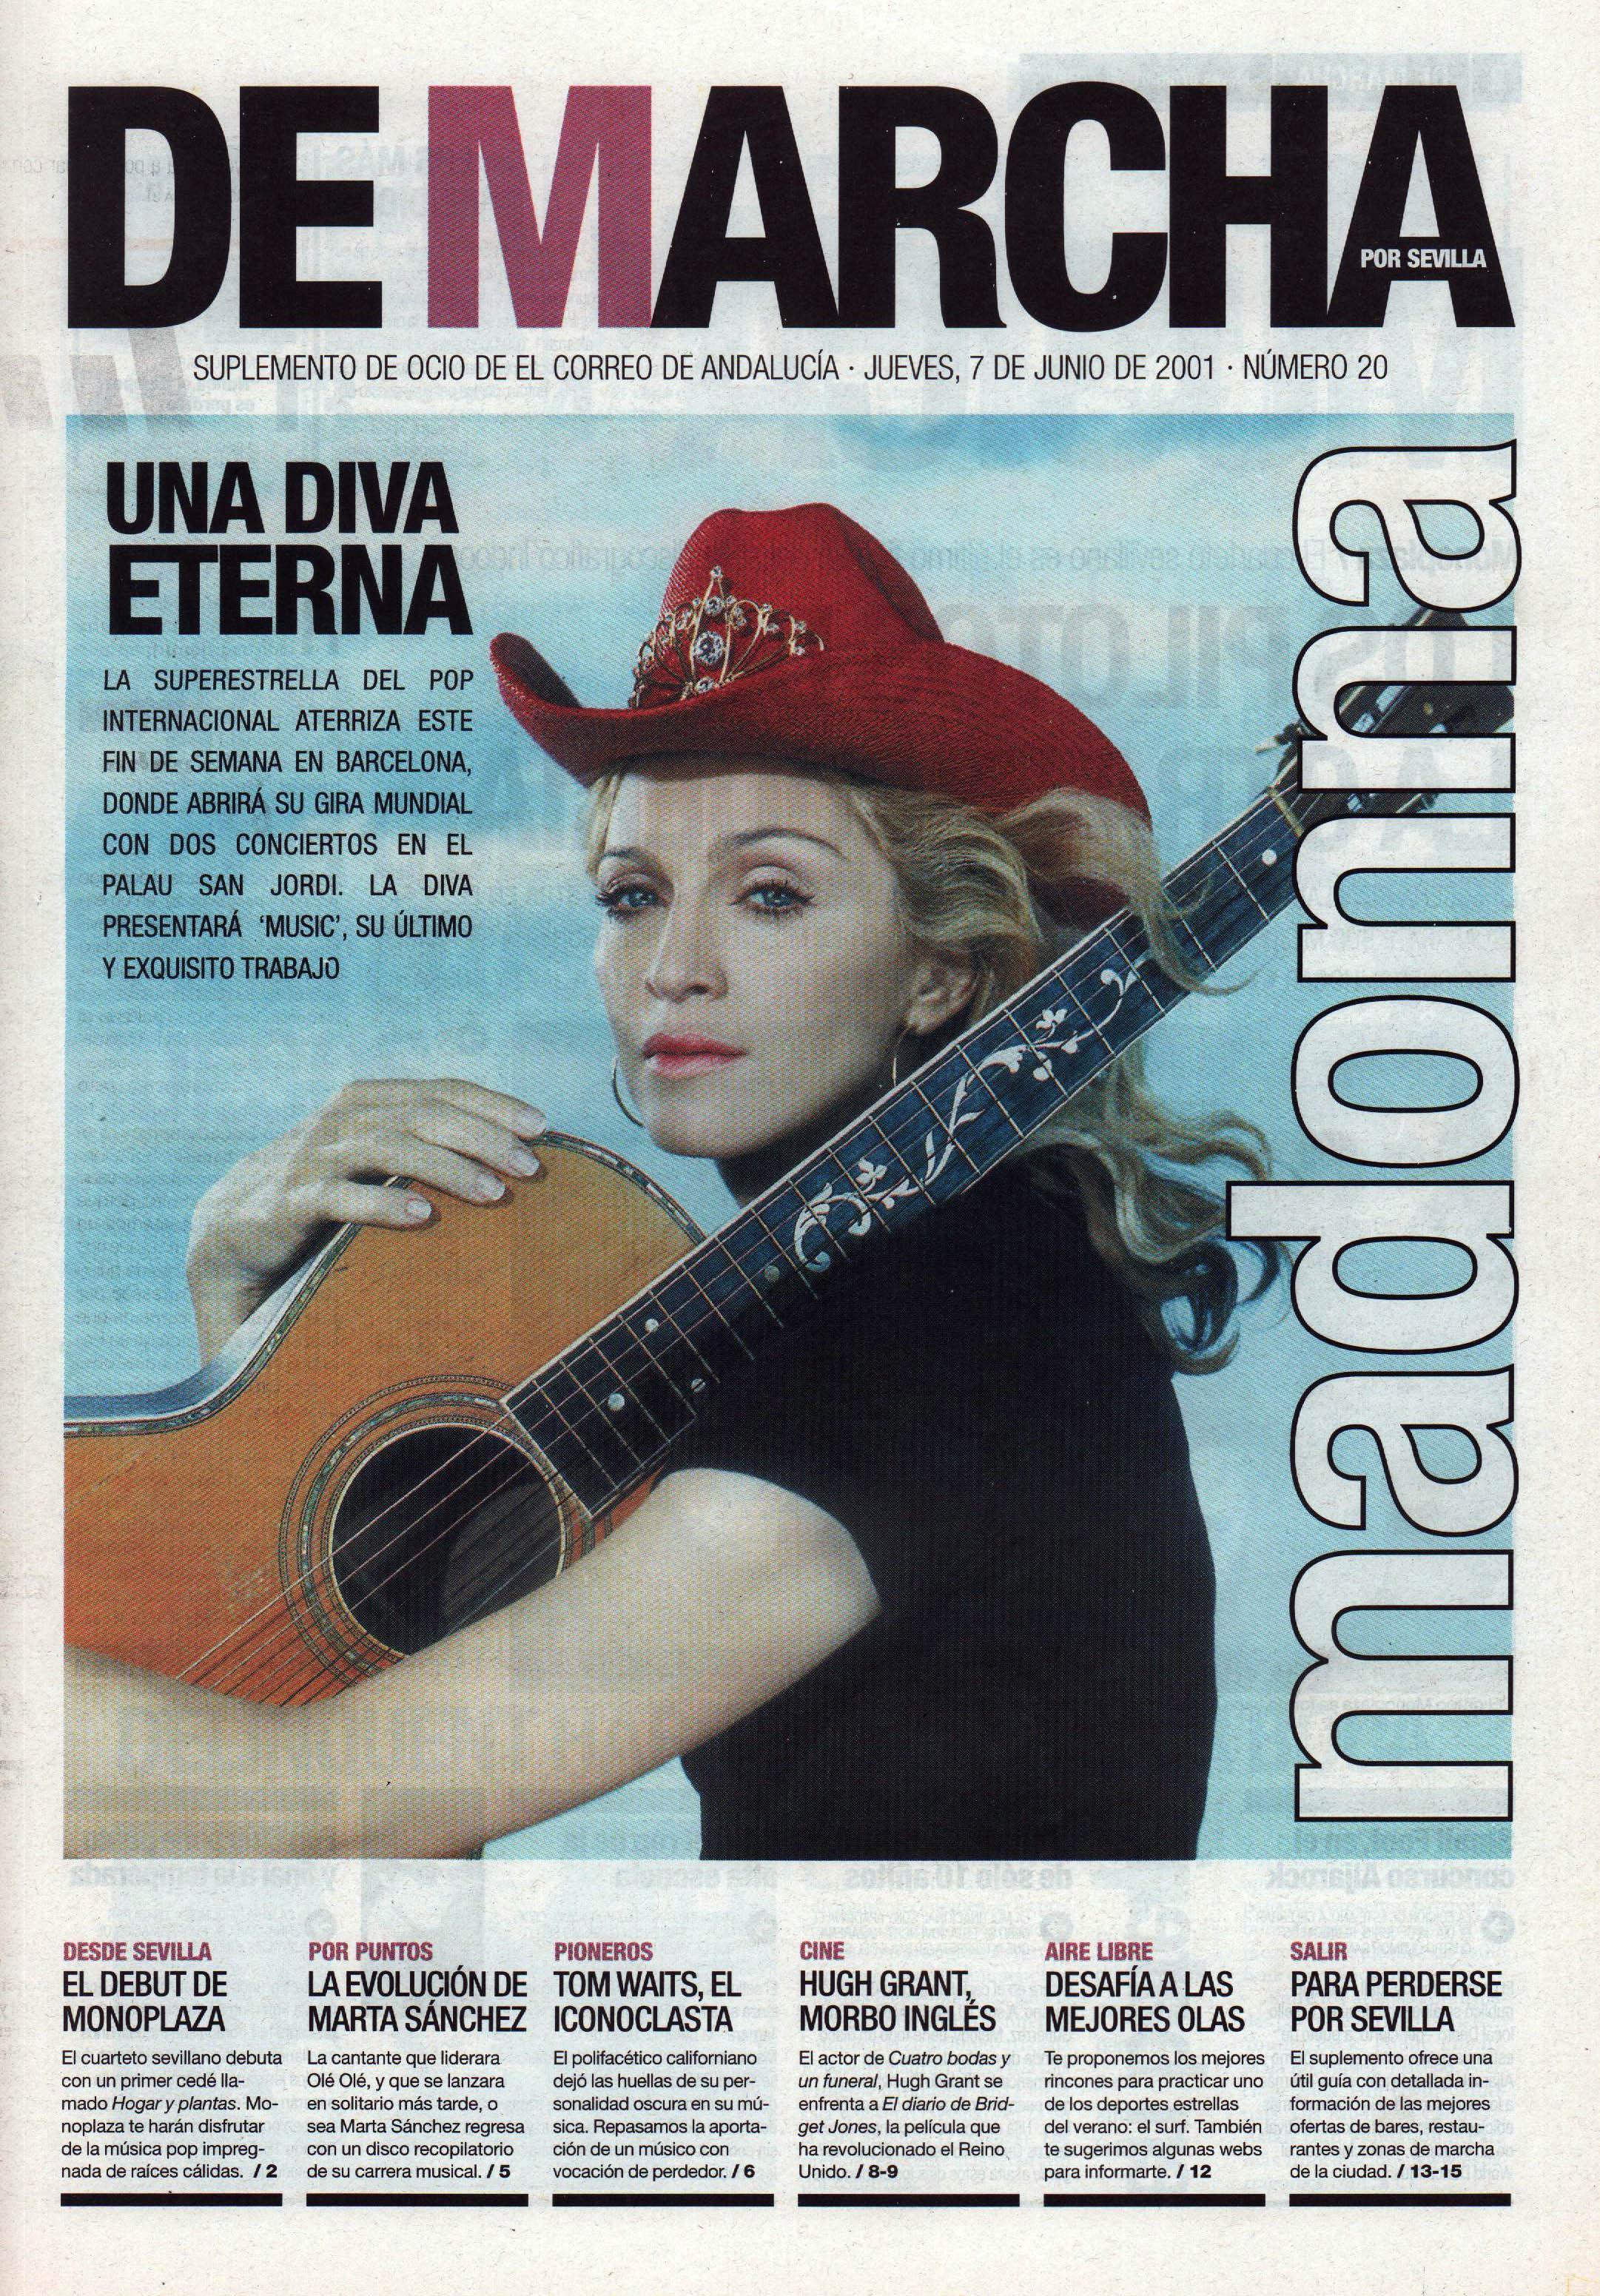 Madonna, una diva eterna   De Marcha - El Correo   7 jun 2001